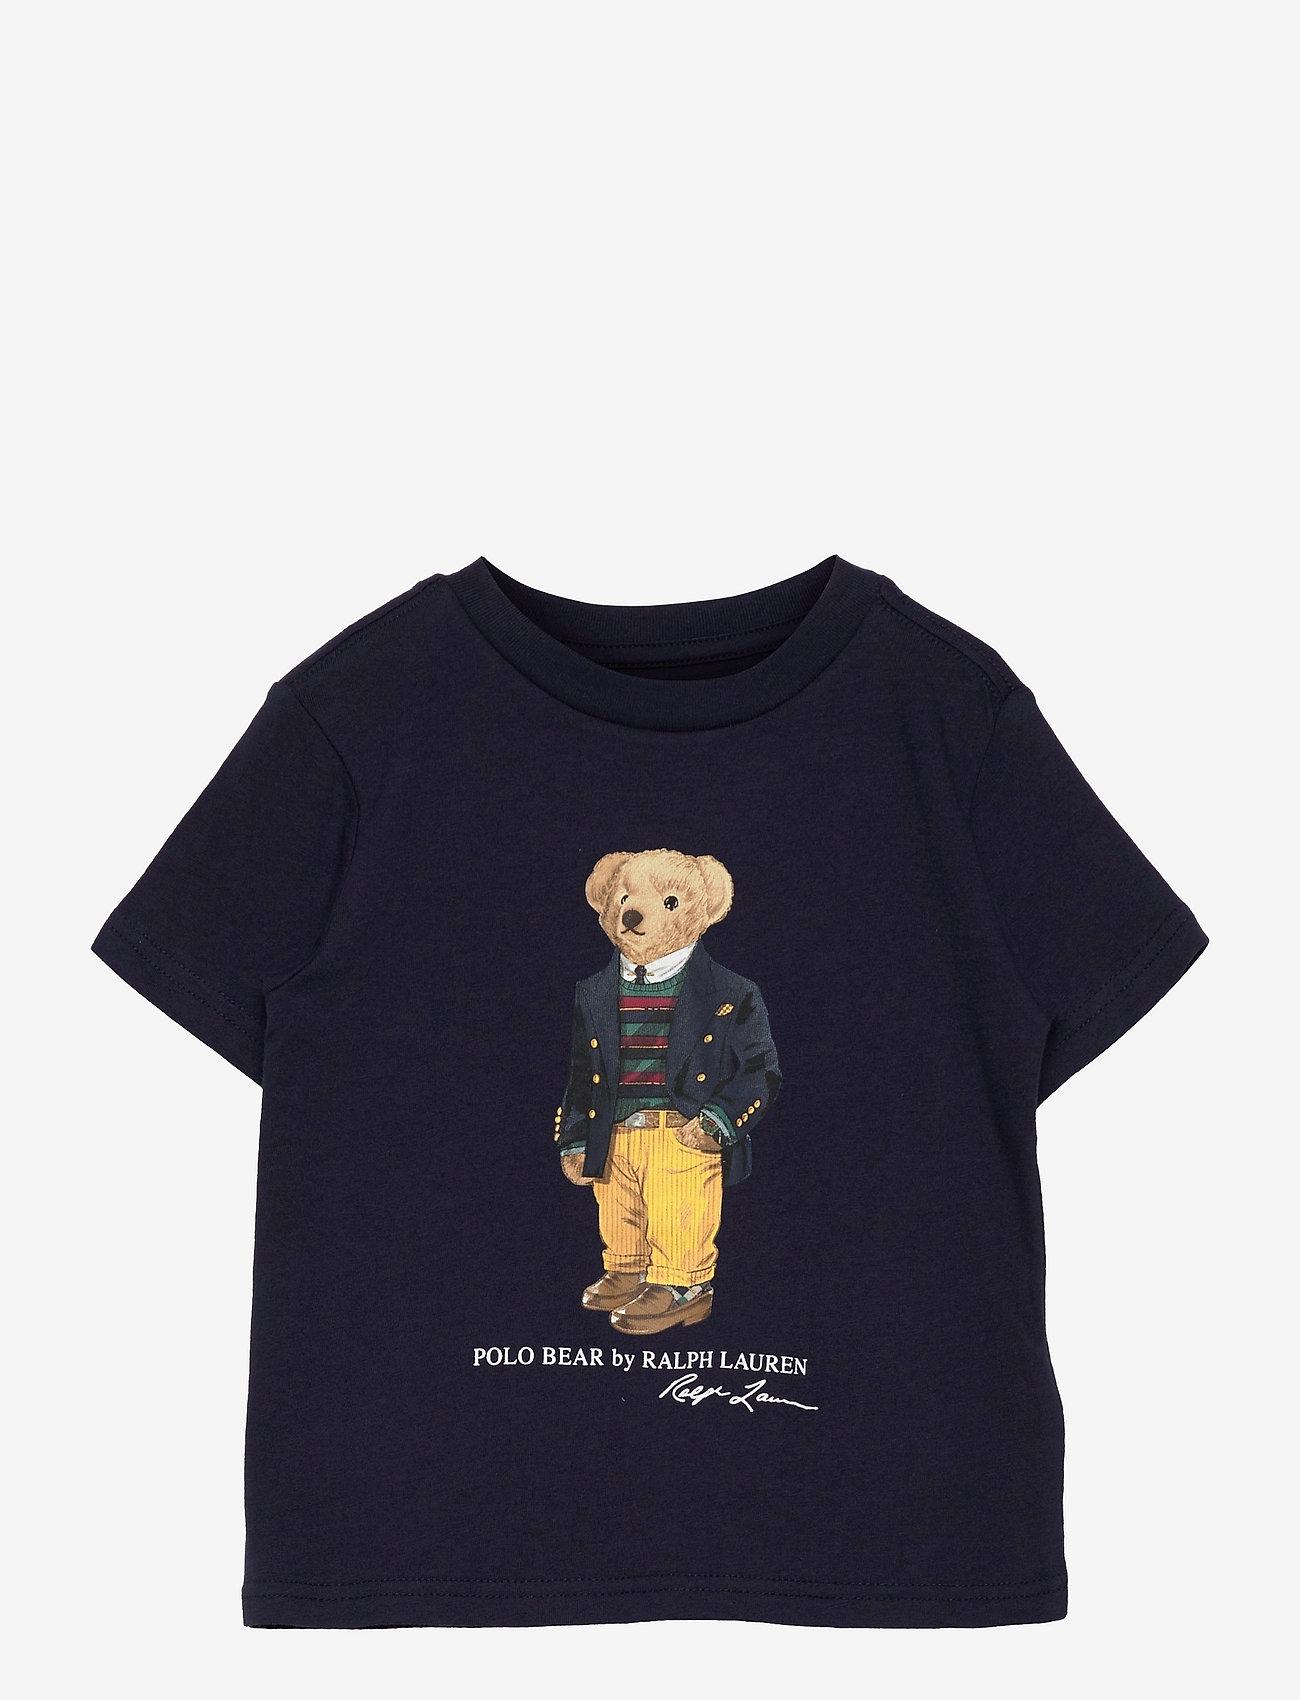 Ralph Lauren Kids - Polo Bear & Big Pony Cotton Tee - pattern short-sleeved t-shirt - cruise navy - 0